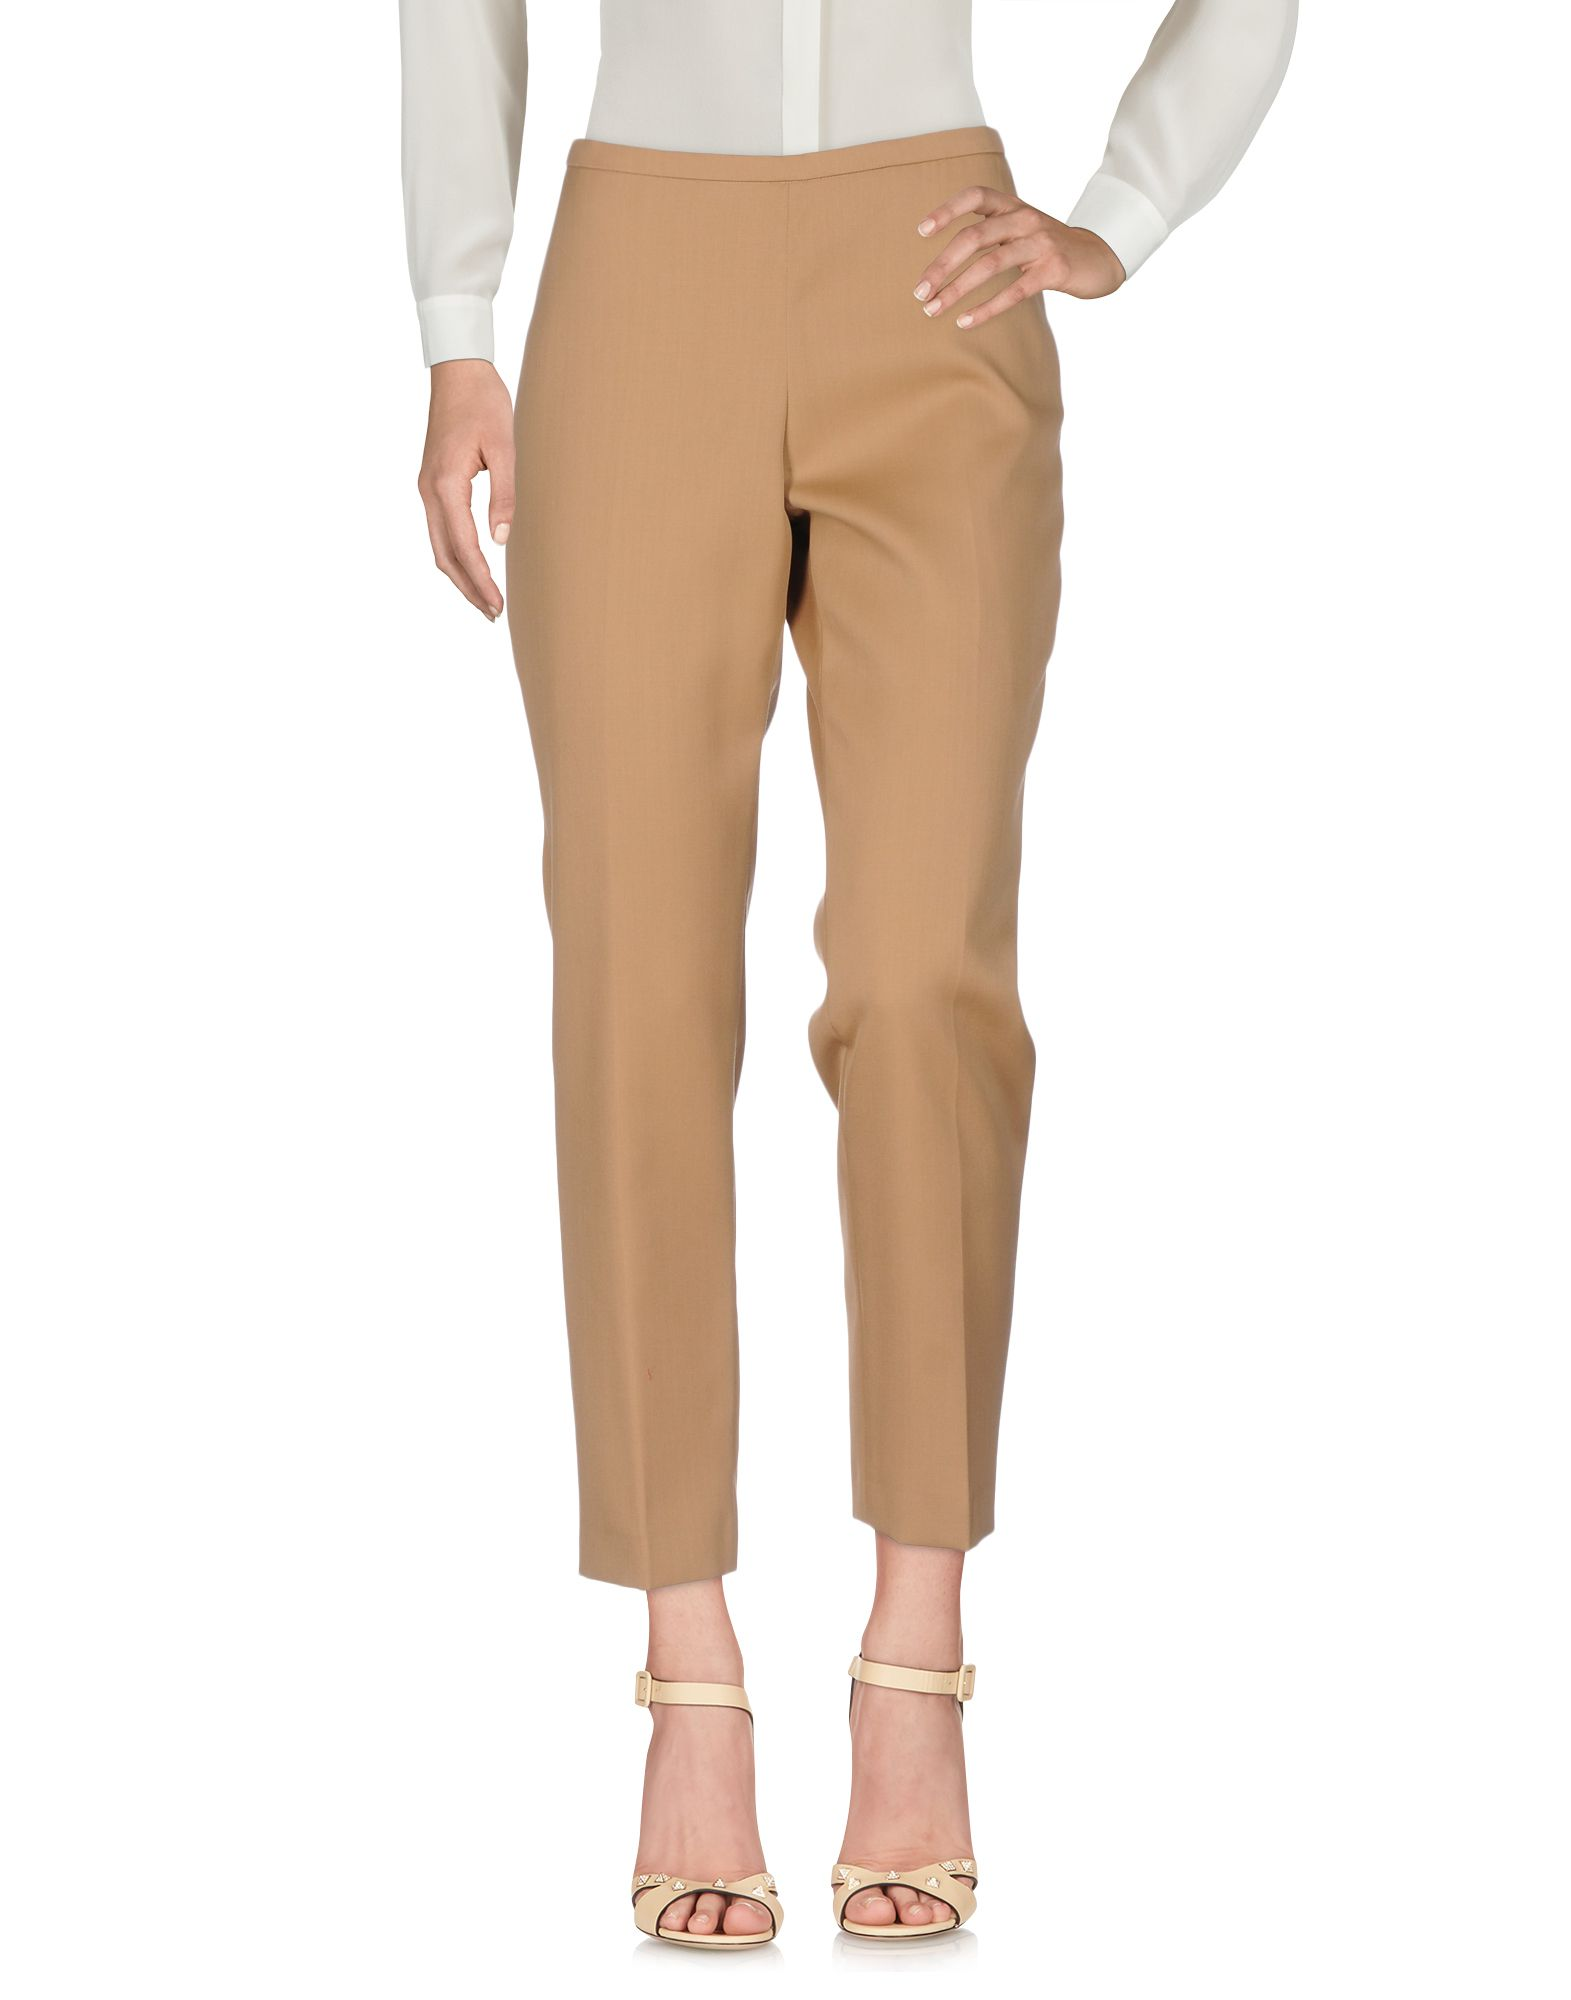 ROCHAS Damen Hose Farbe Khaki Größe 5 - broschei